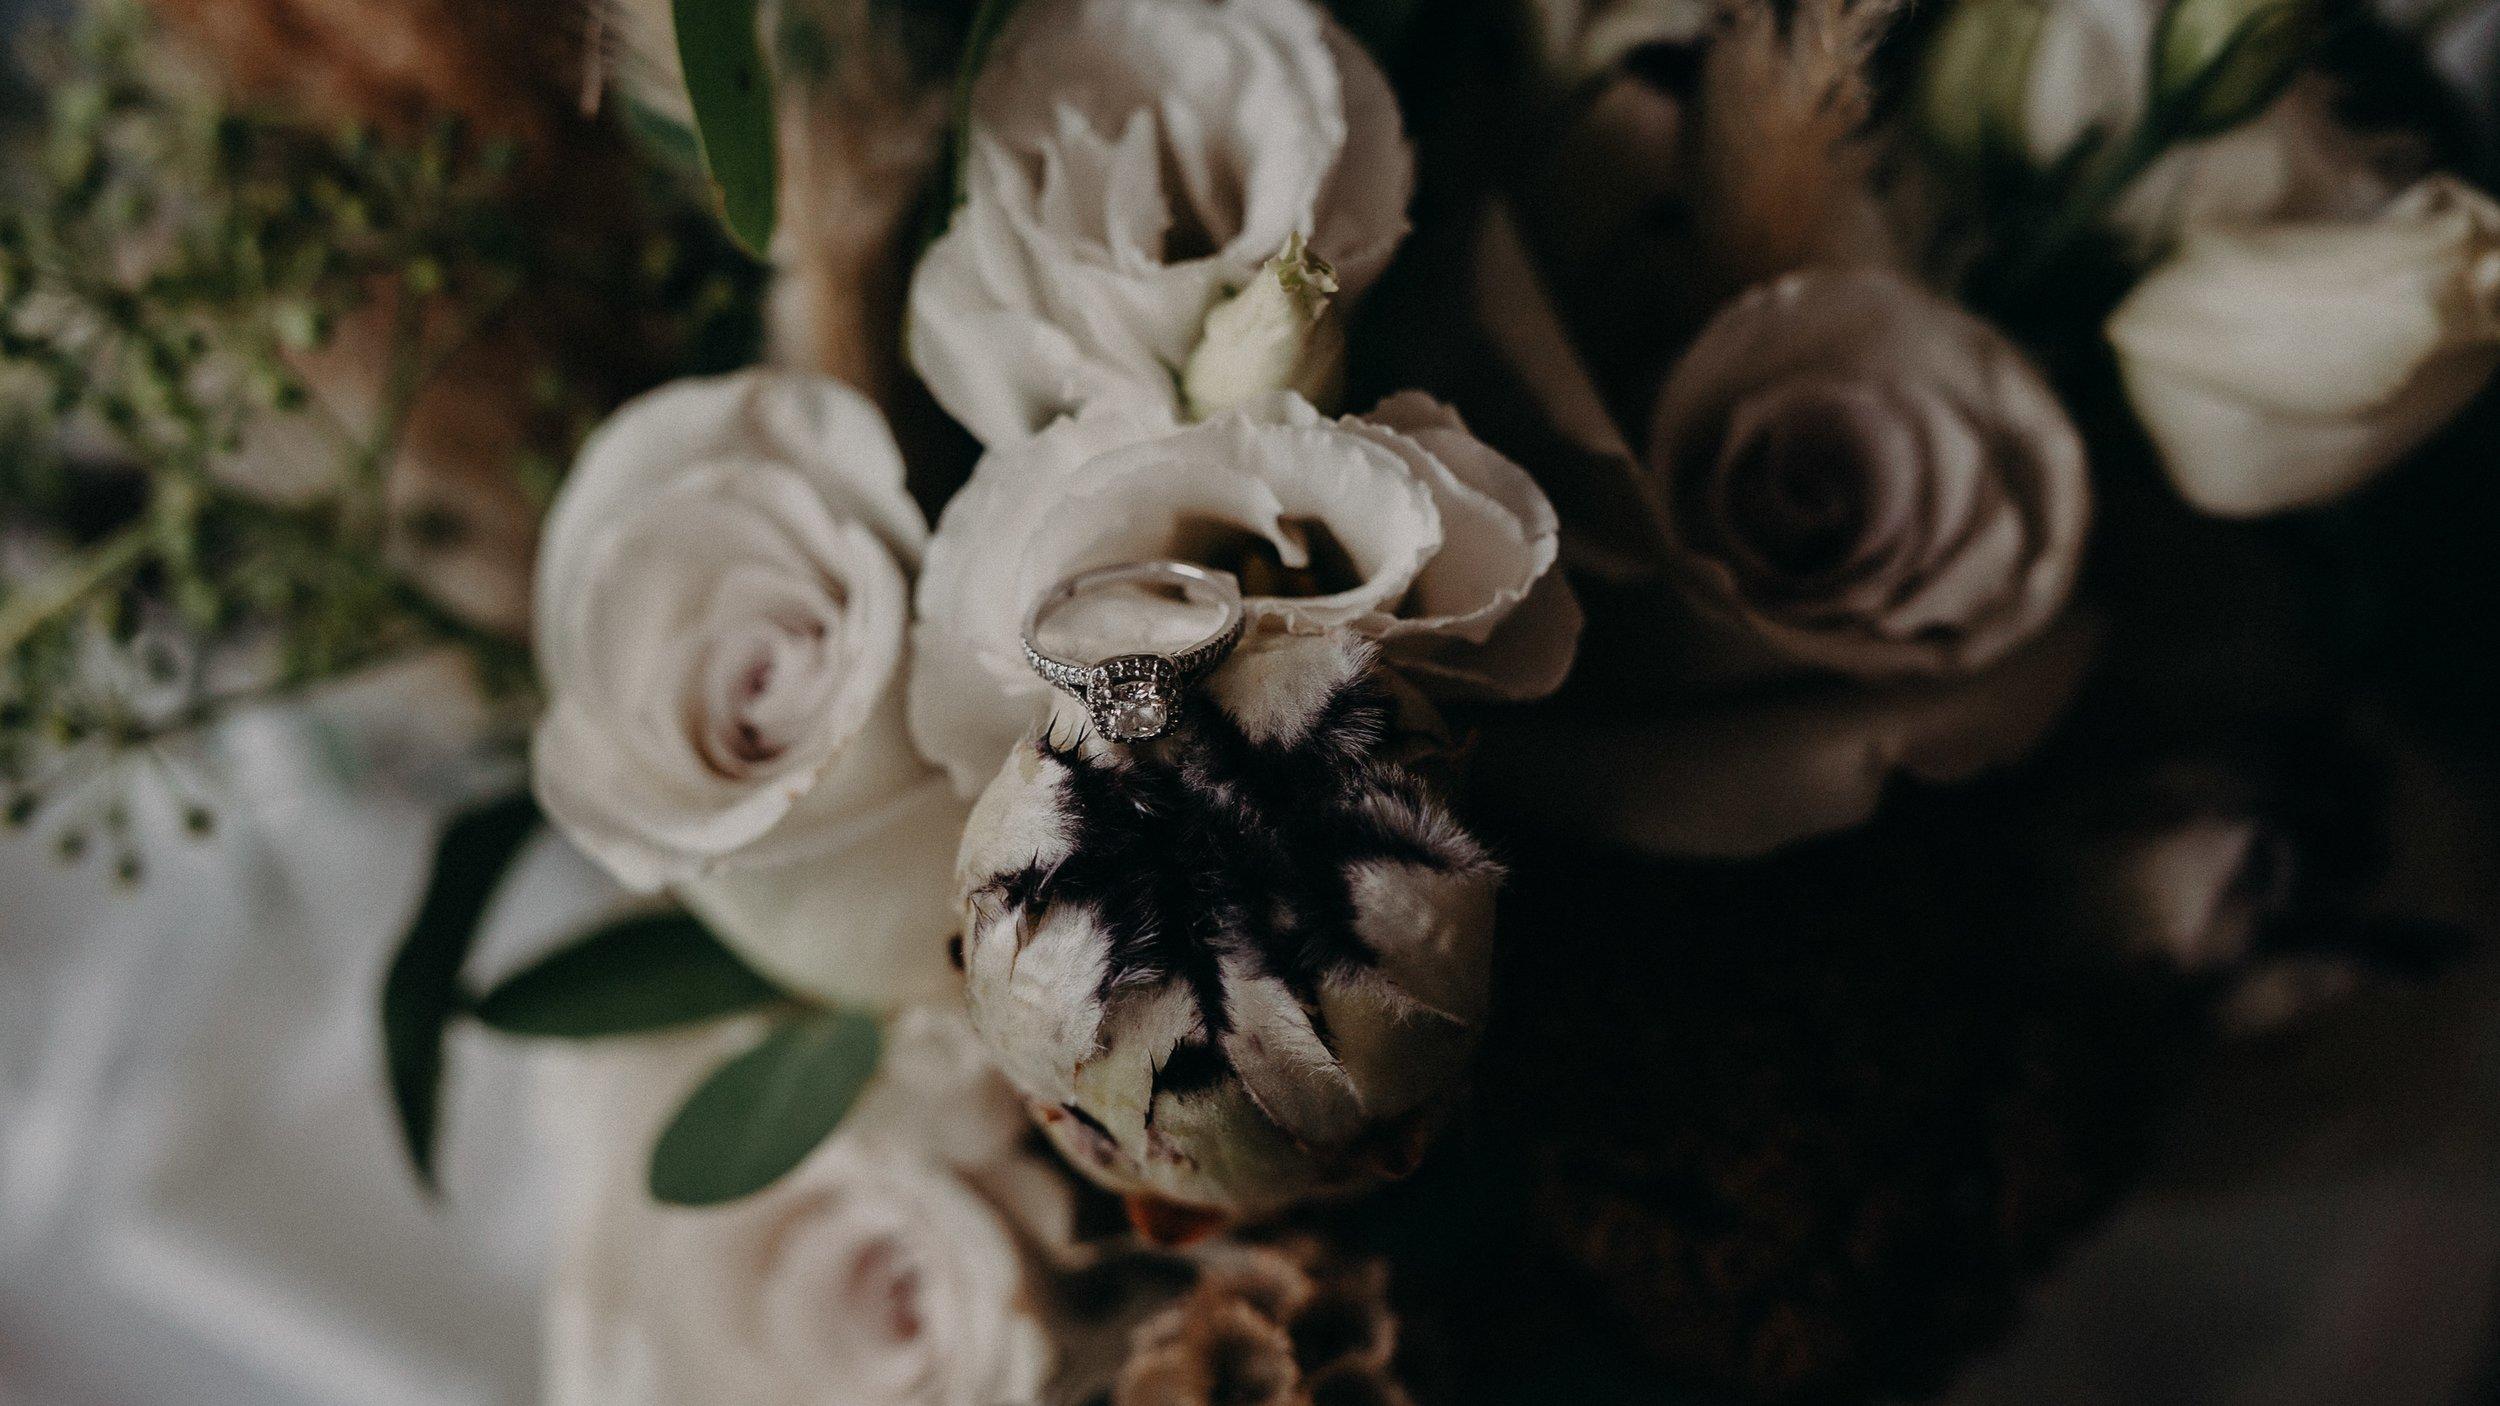 mickalathomas_puremacphotography_weddingphotographer_couplephotographer_Sheppartonphotographer_1526.jpg